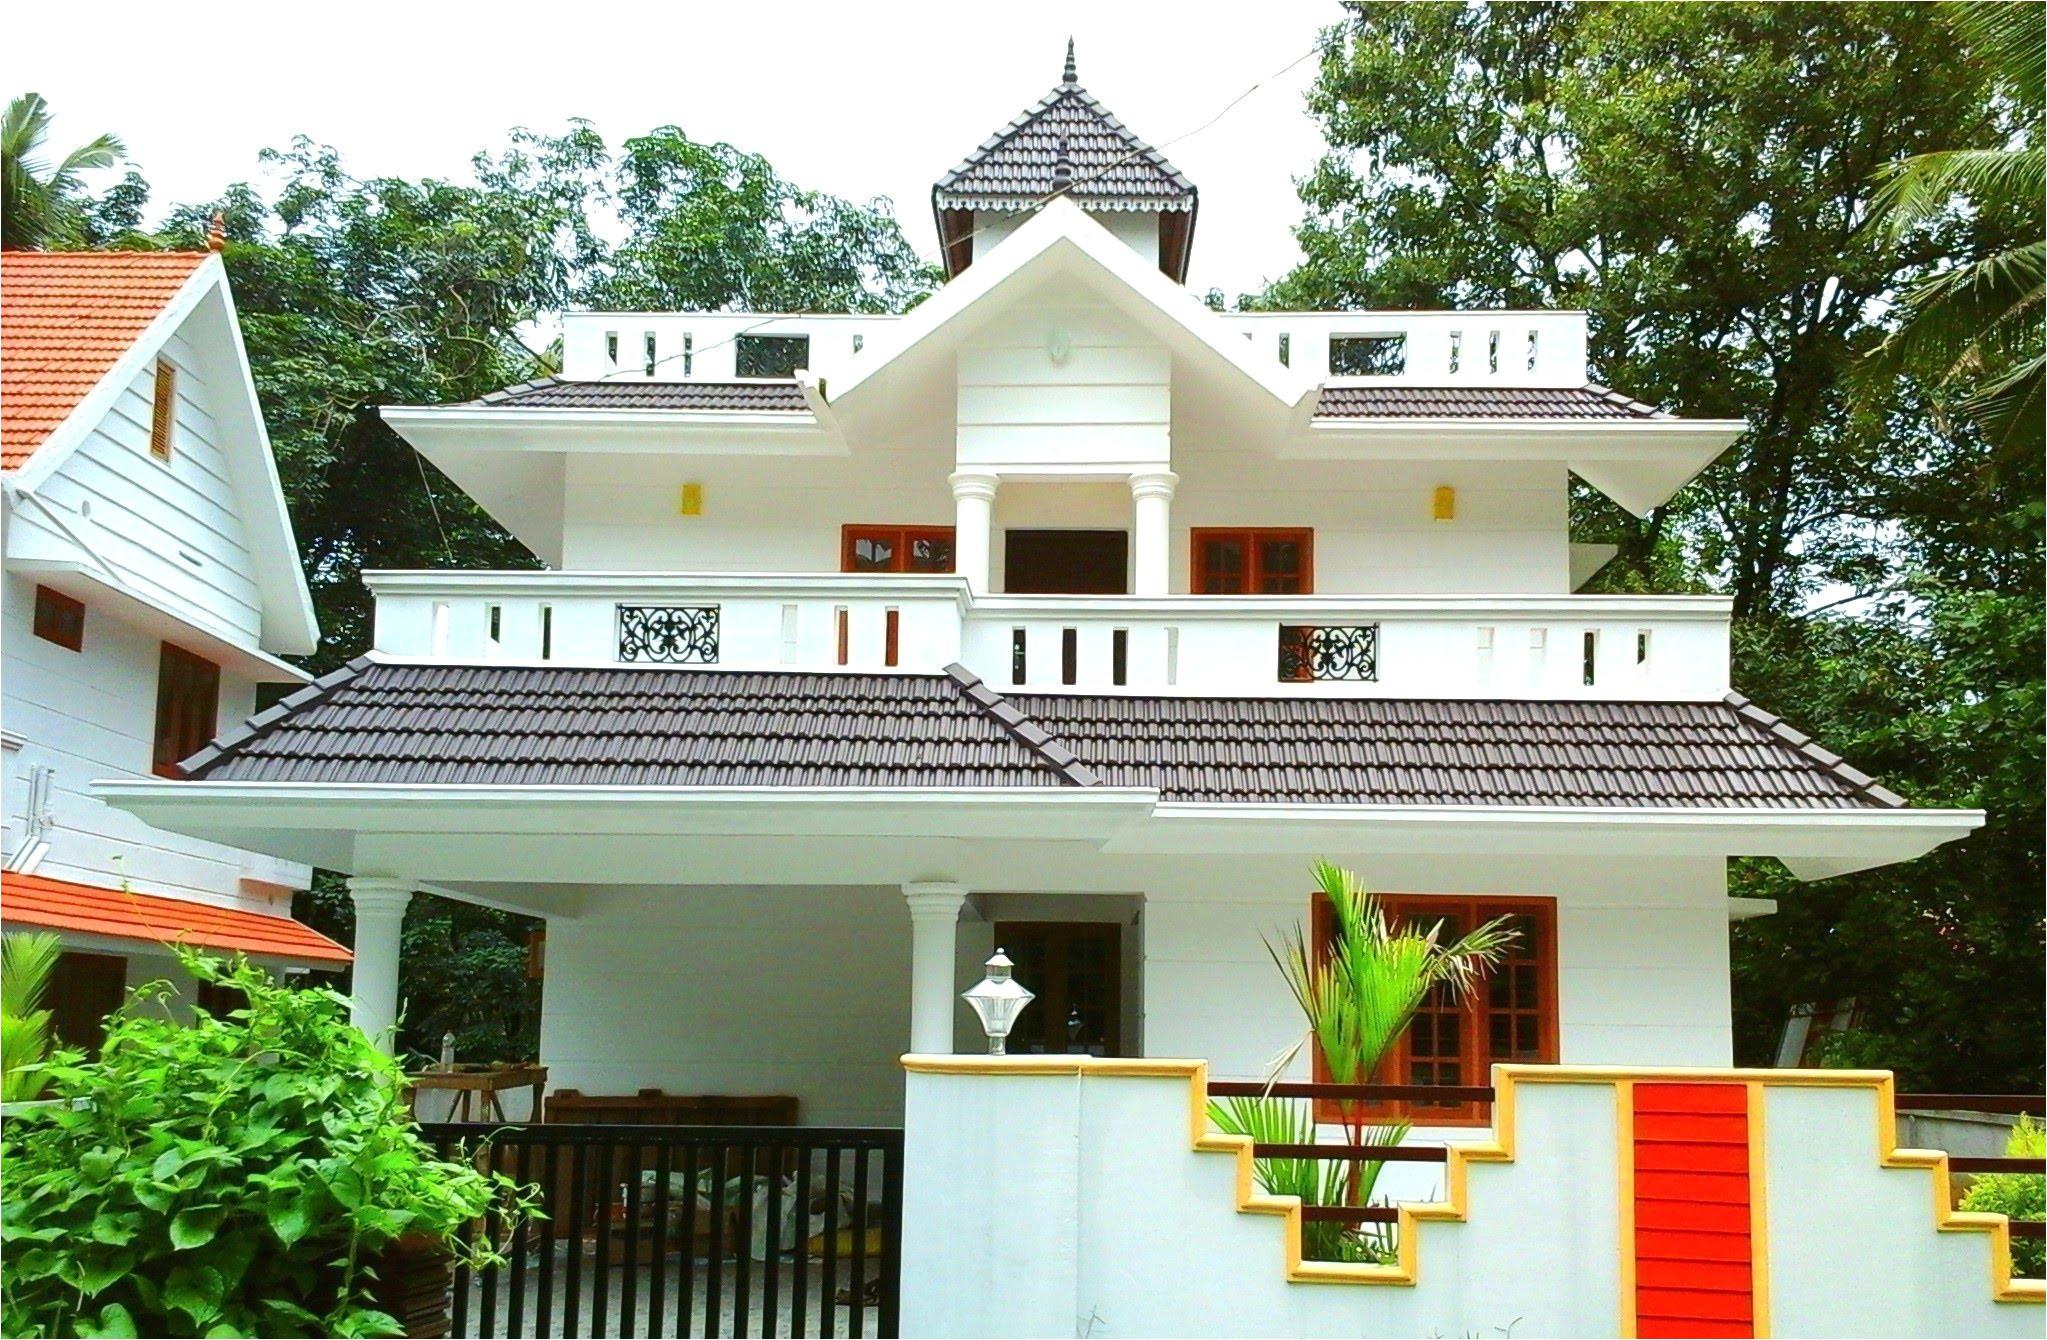 Home Design Plans with Photos In Kerala Medium House Plans with Photos In Kerala Modern House